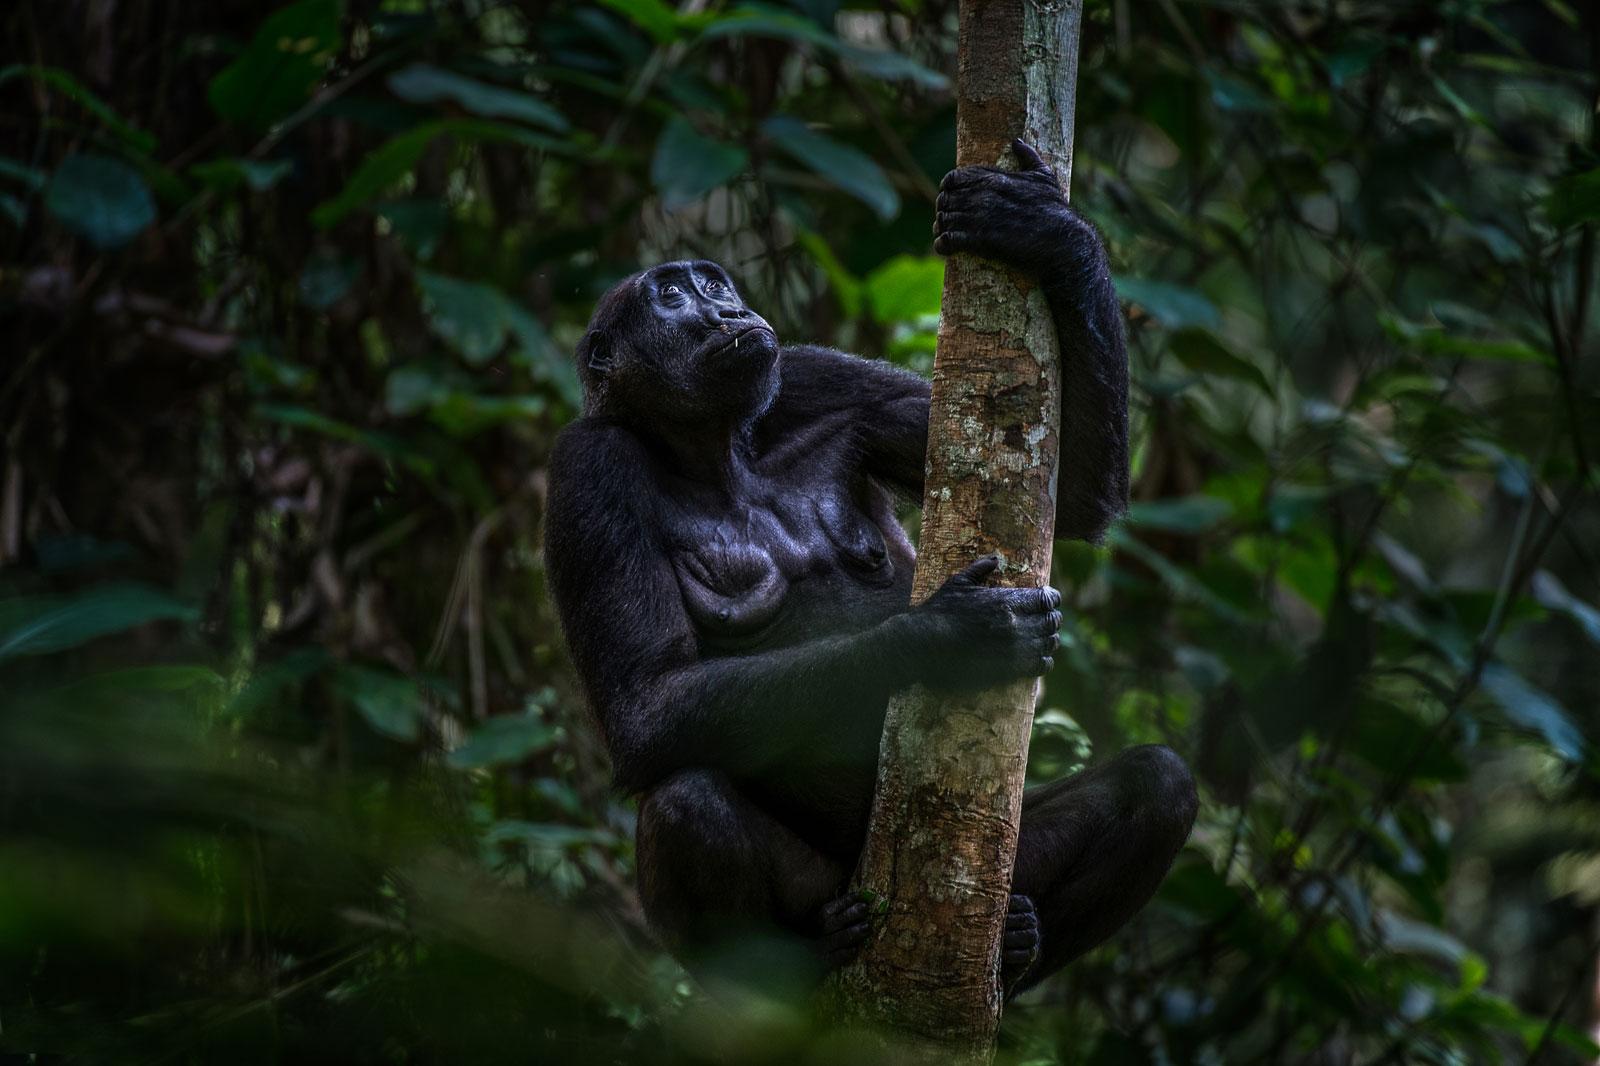 congo-gorilla-1_Michael-Viljoen